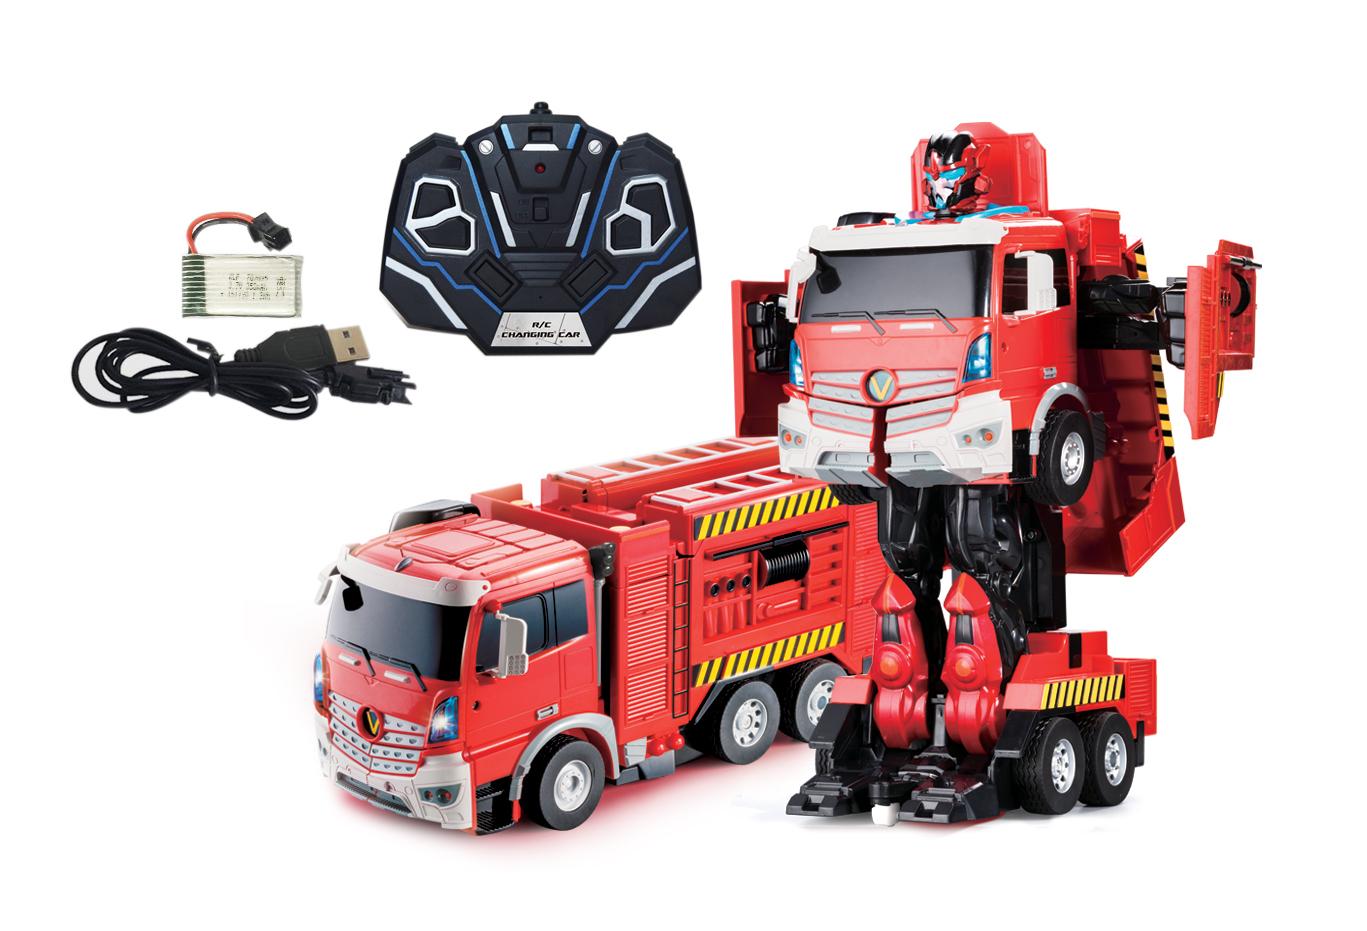 Робот-трансформер р/у 1toy Грузовик грузовик play smart трансформер fullfunk на р у 9200